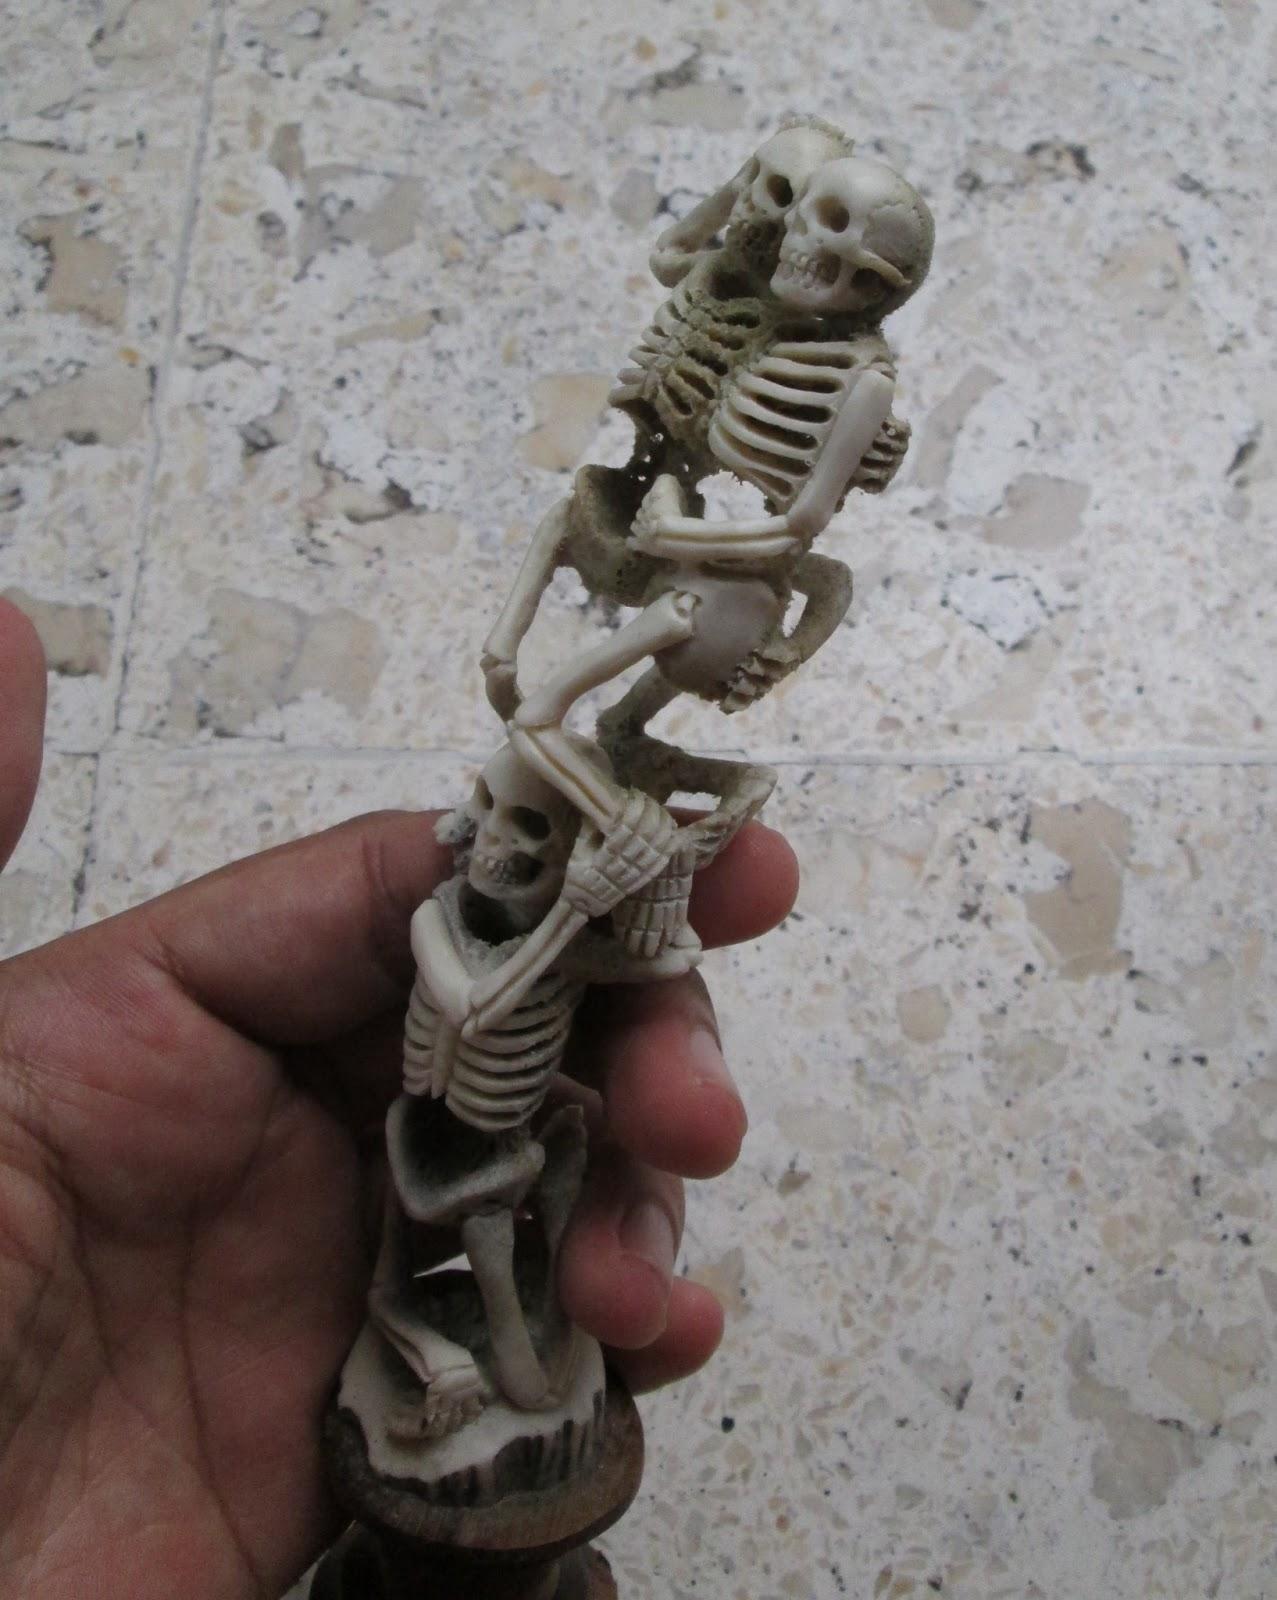 Skeleton Group Carving in Antler